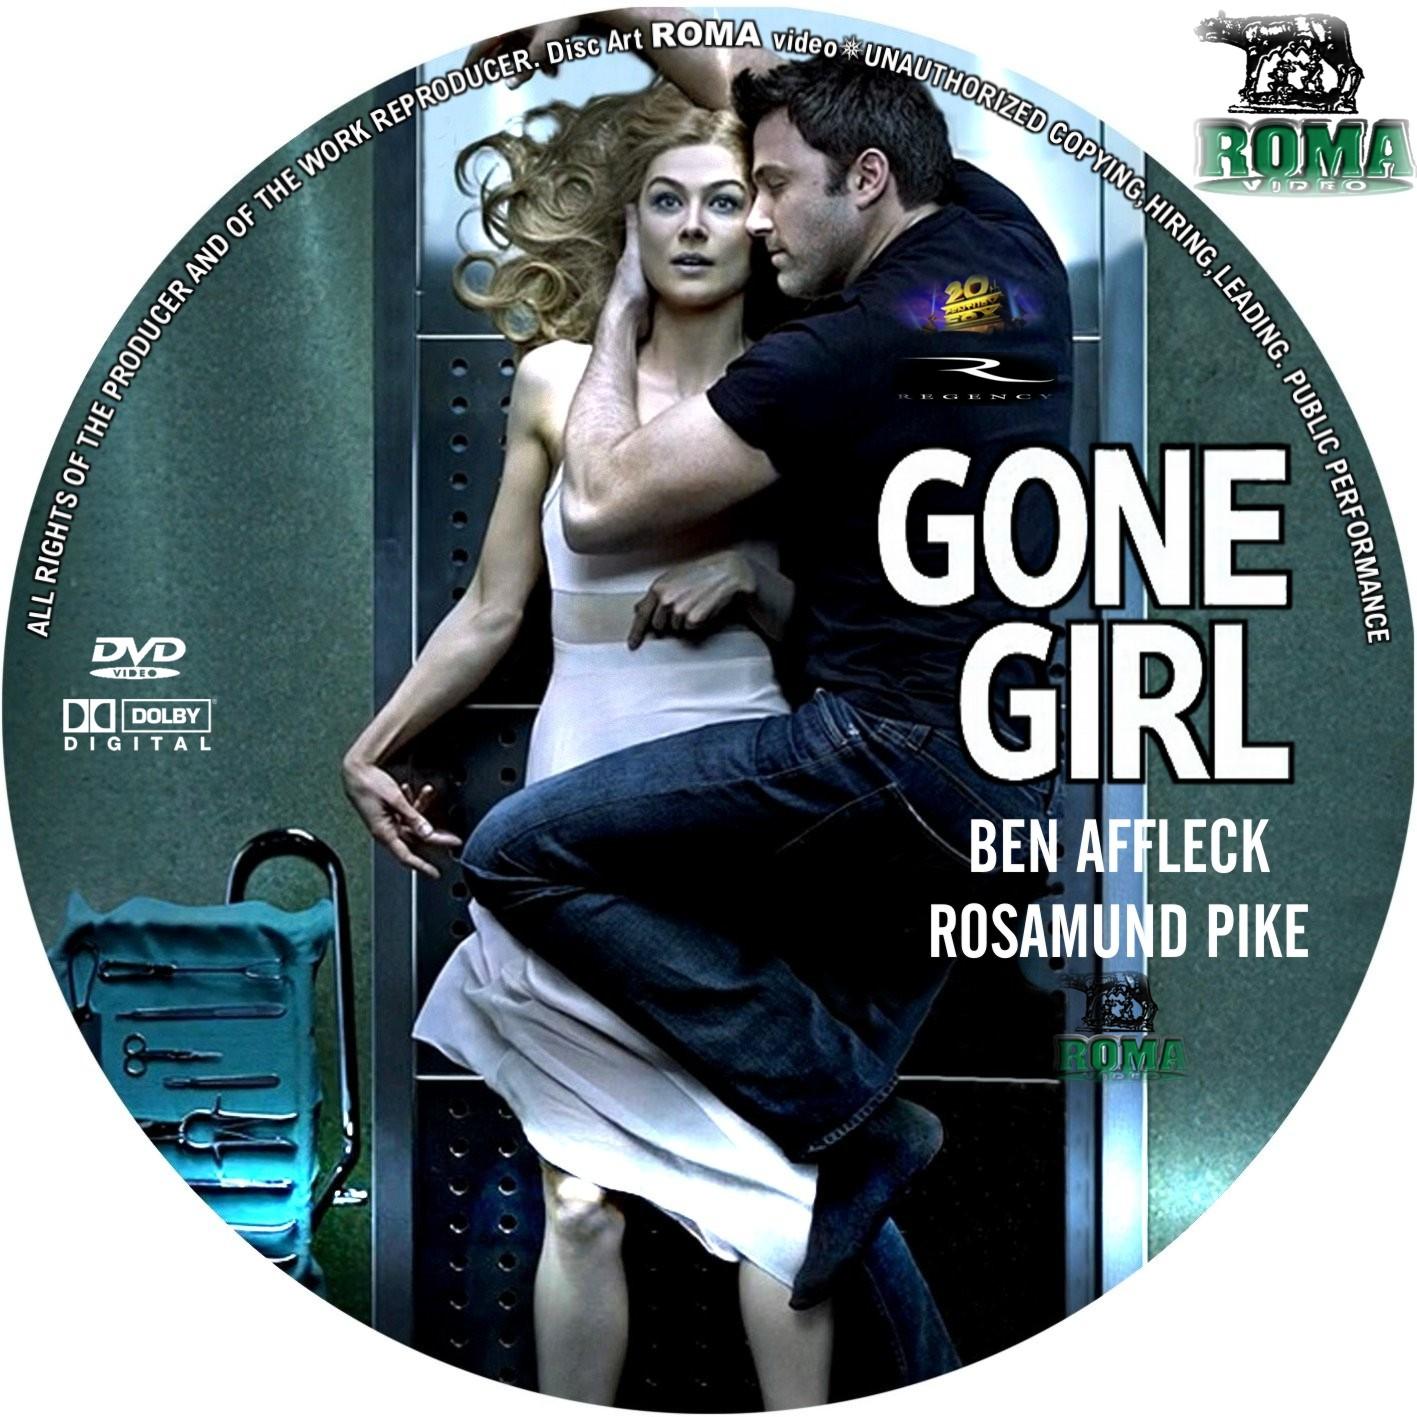 gone girl full movie download hd